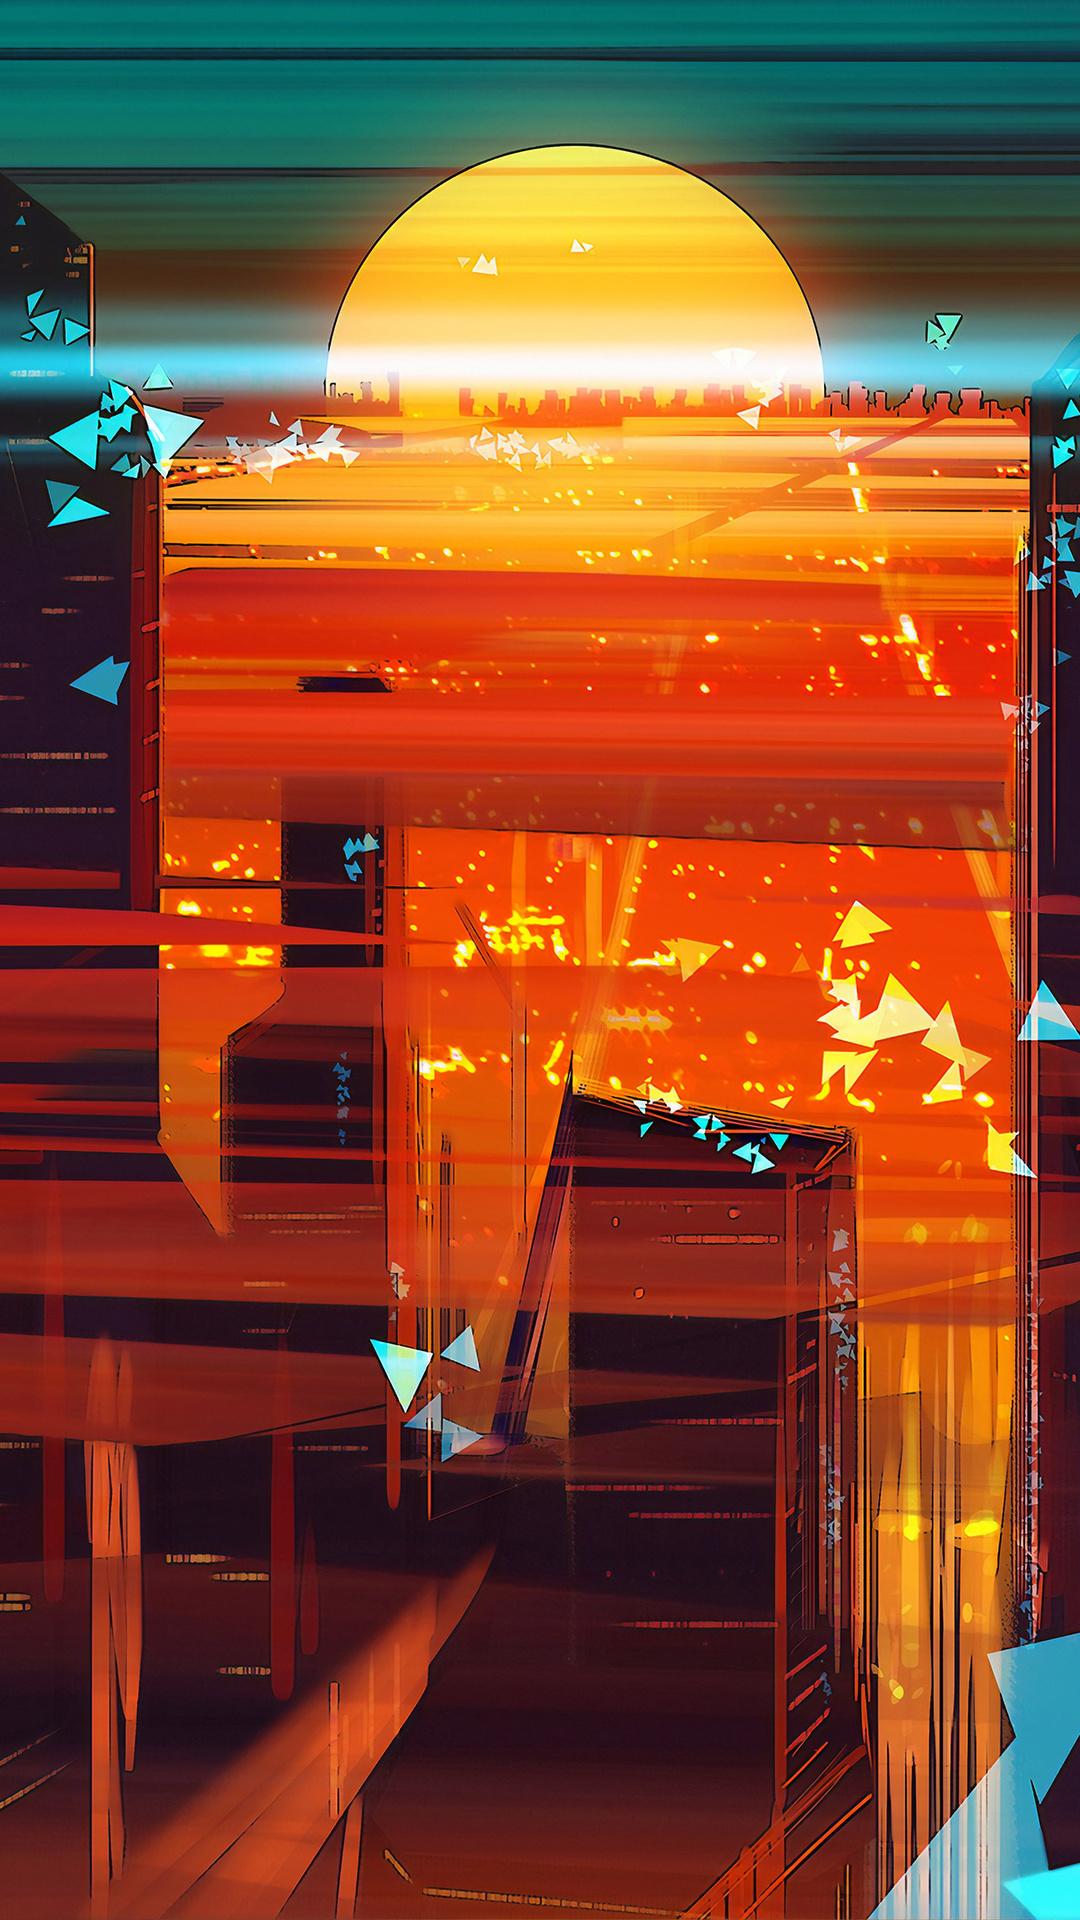 abstract-city-4k-z4.jpg